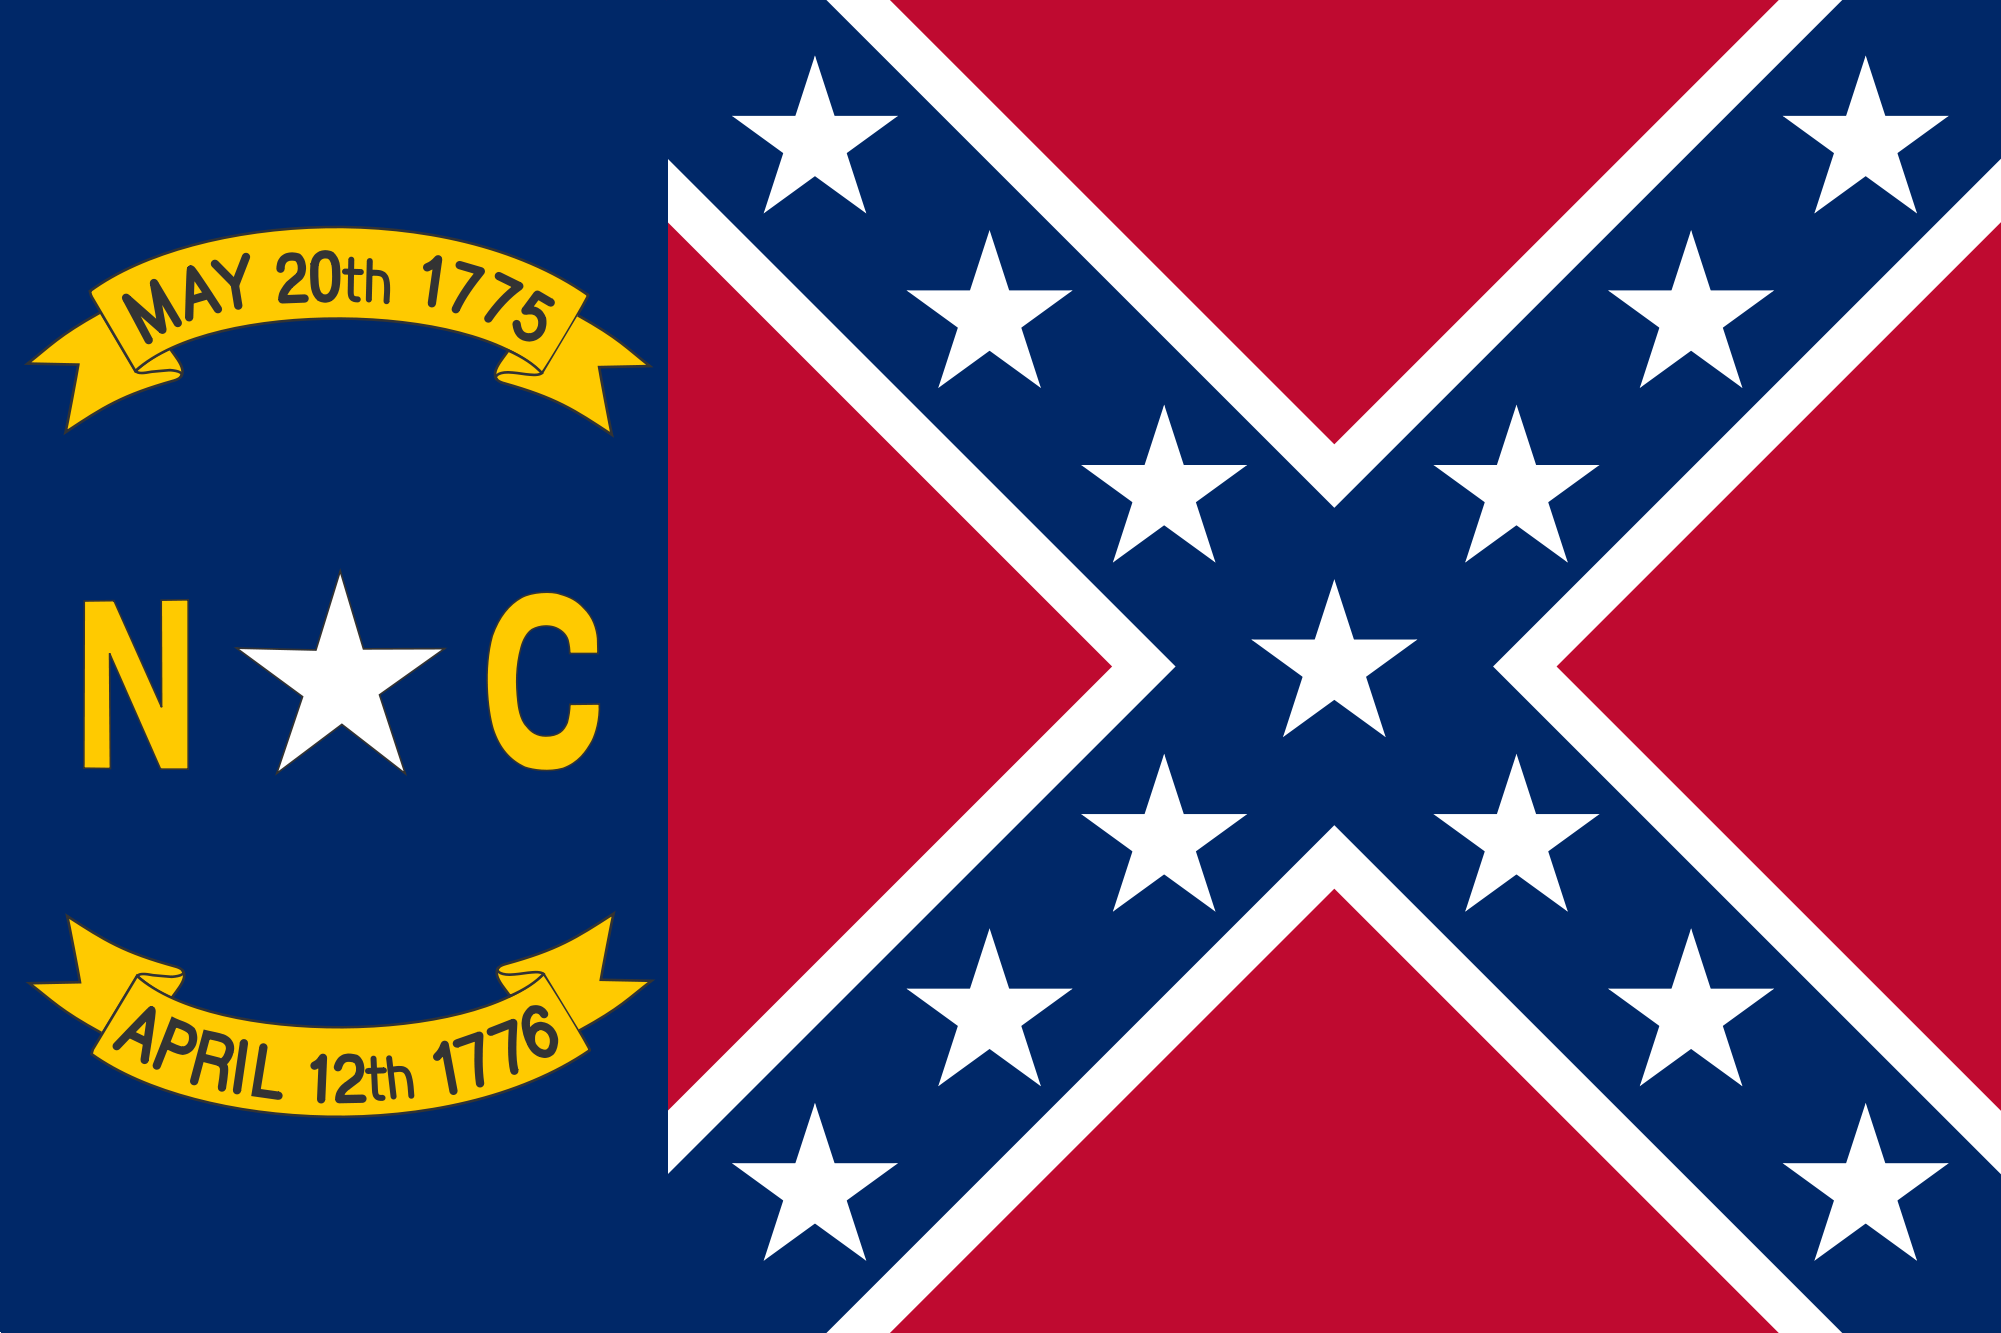 FileNorth Carolina Rebel Flagpng Wikimedia Commons - north flags